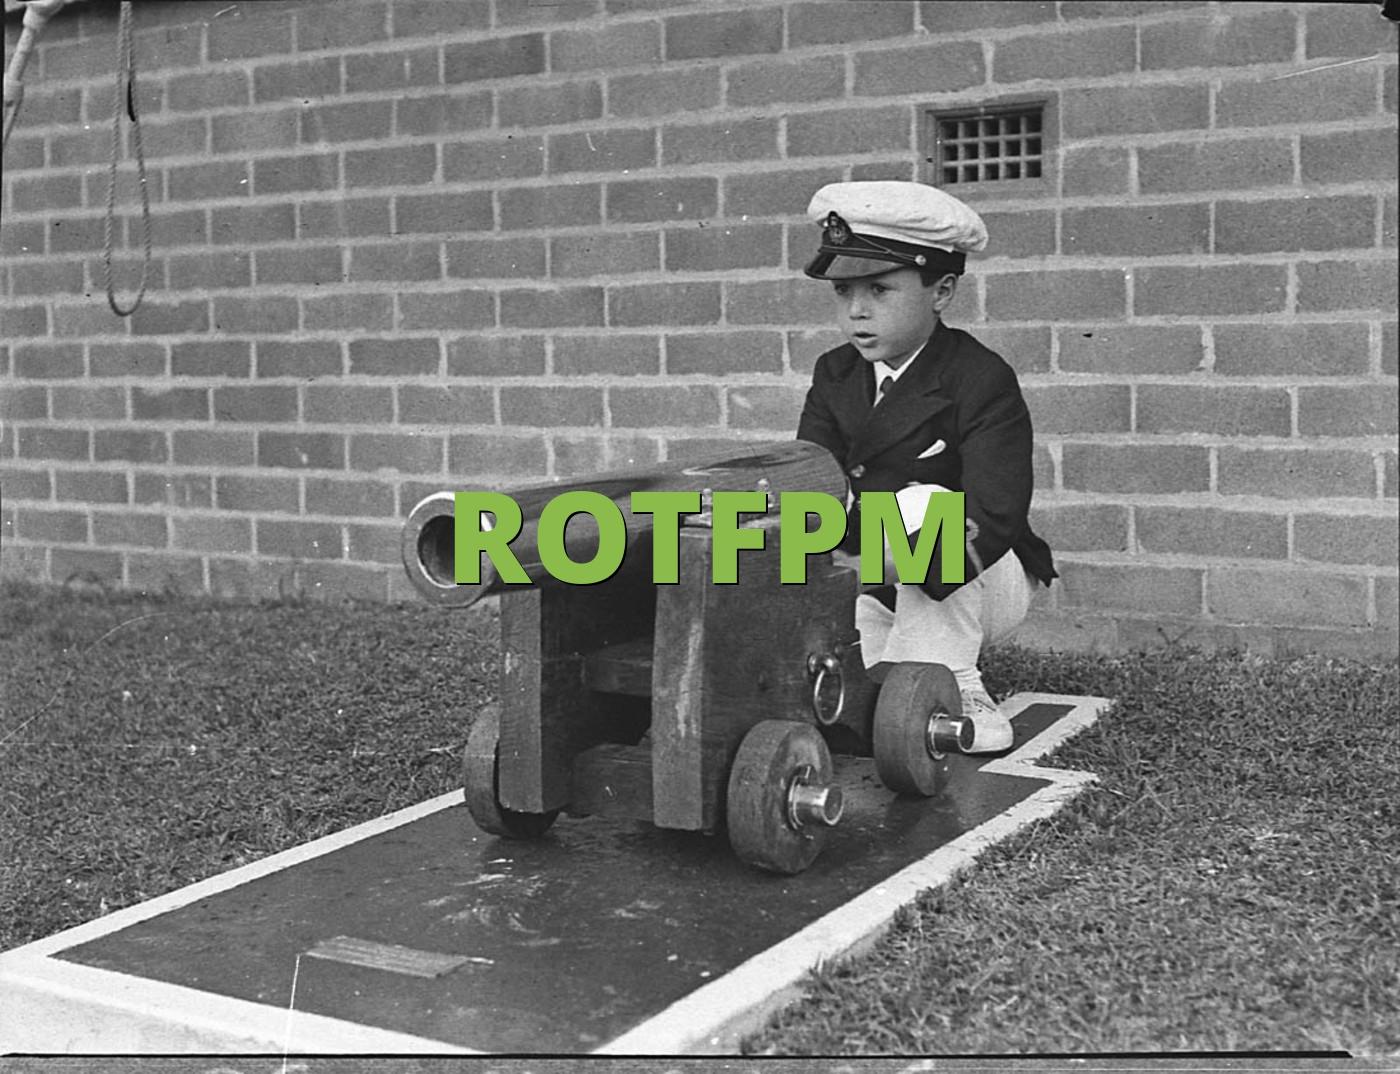 ROTFPM